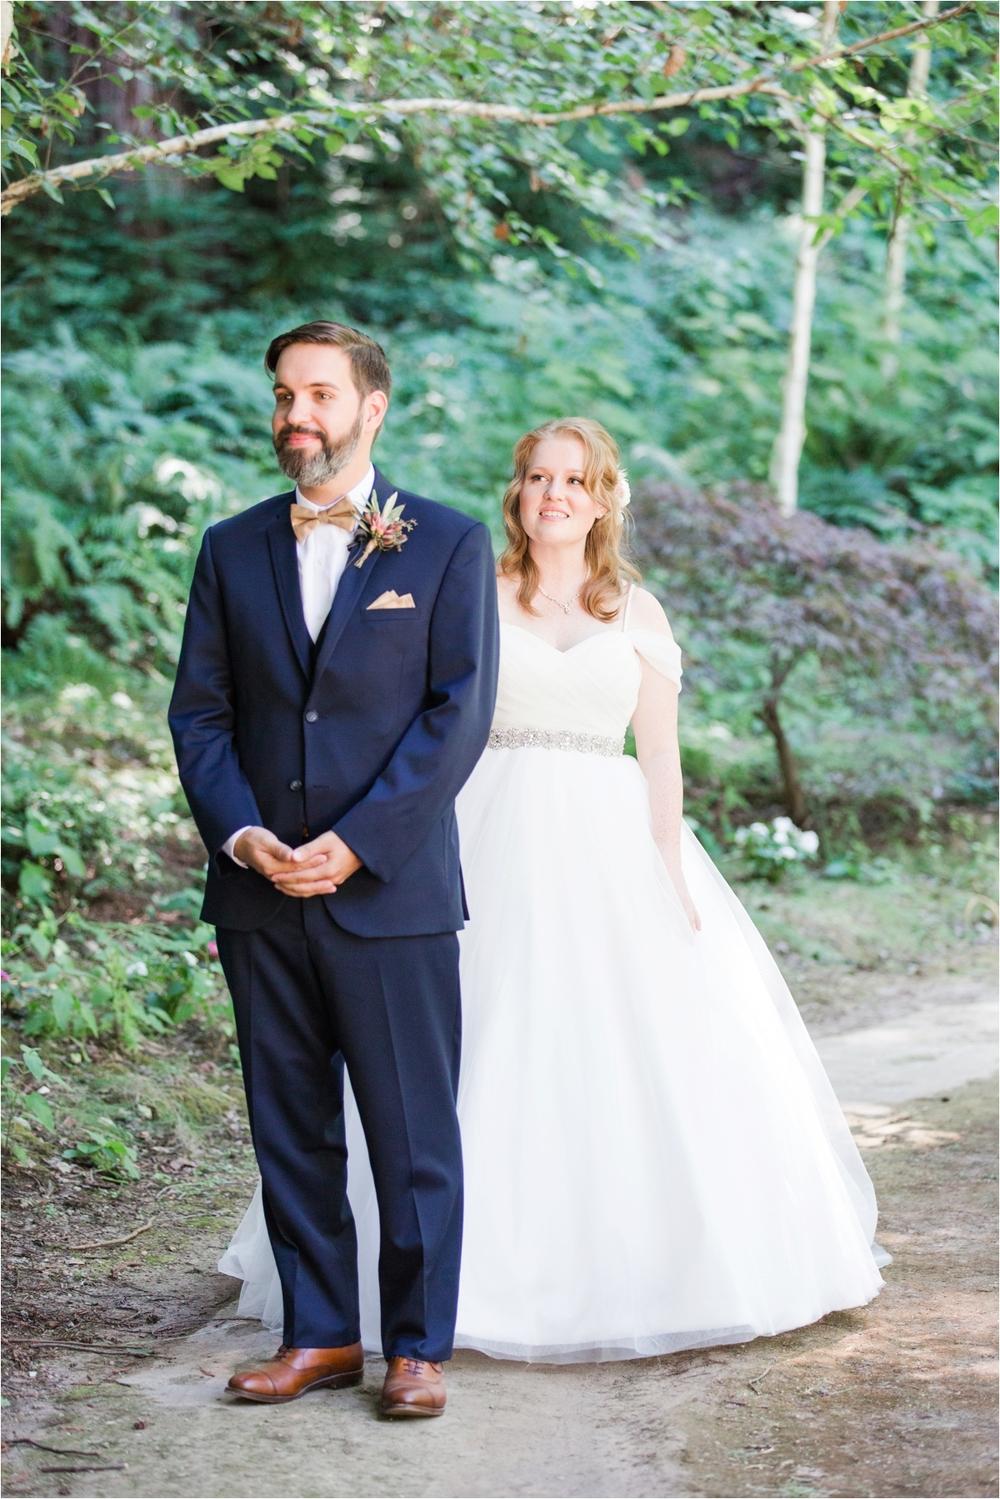 Nestldown wedding Photos by Briana Calderon Photography_0184.jpg